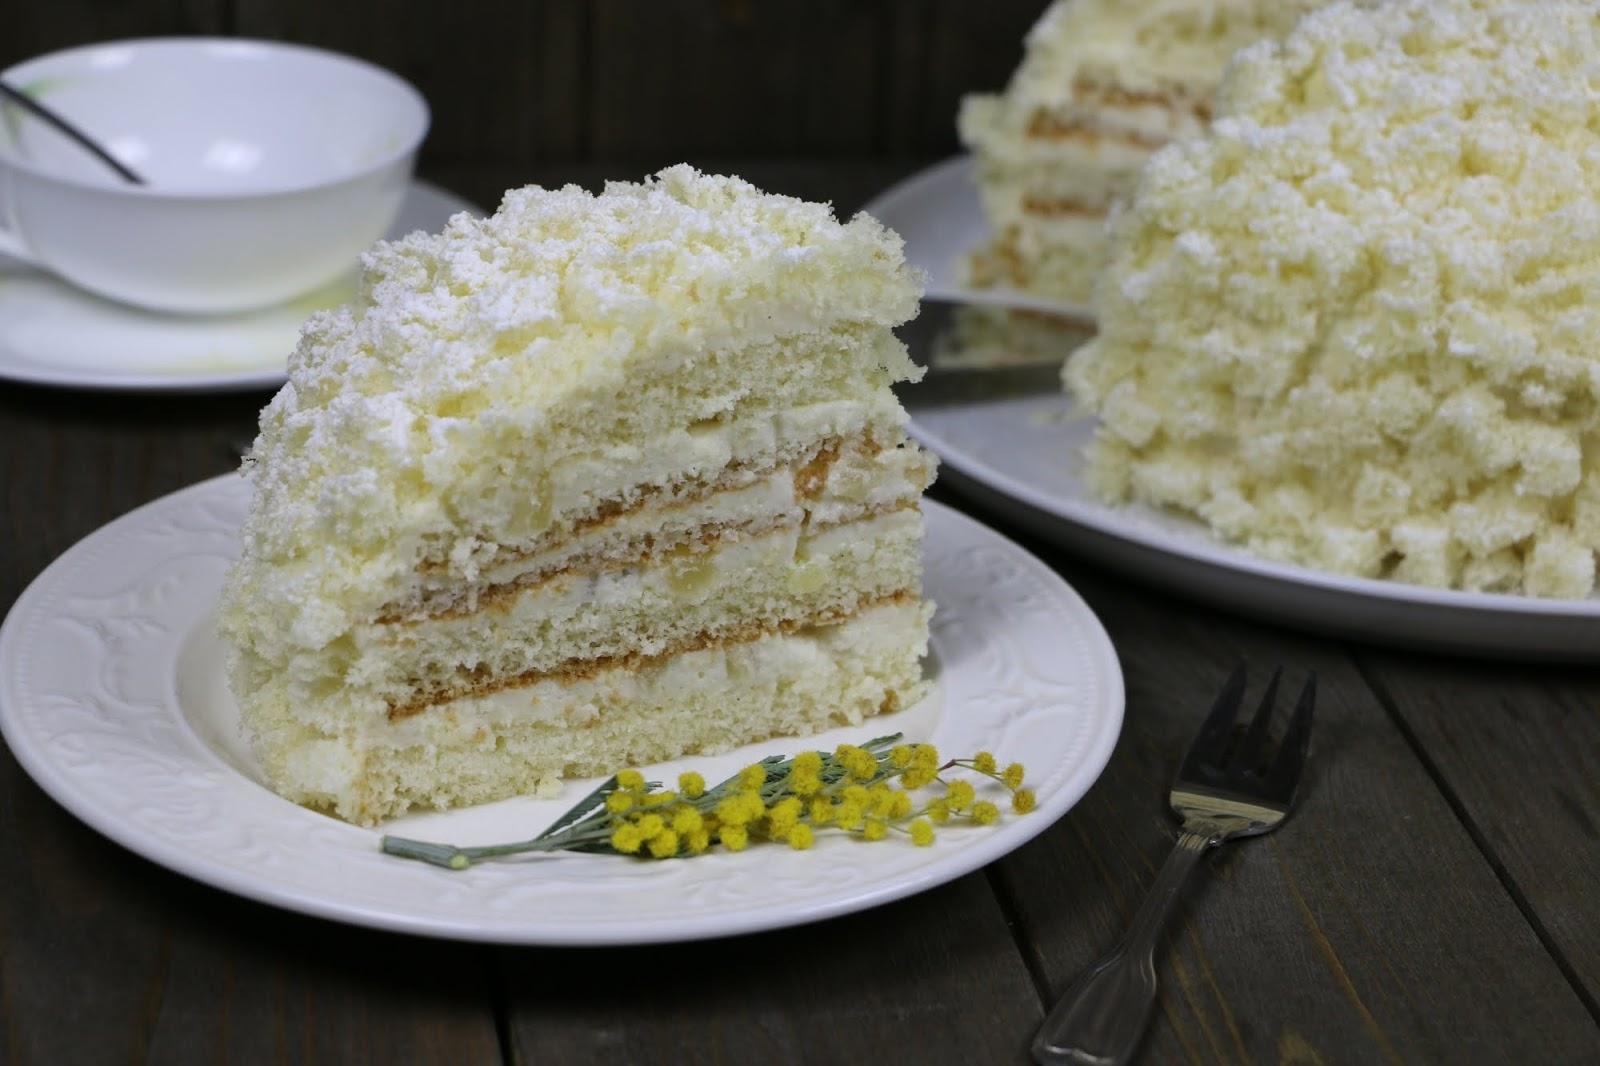 придают дамам торт мимоза рецепт с фото пошагово монтажа порога балкон